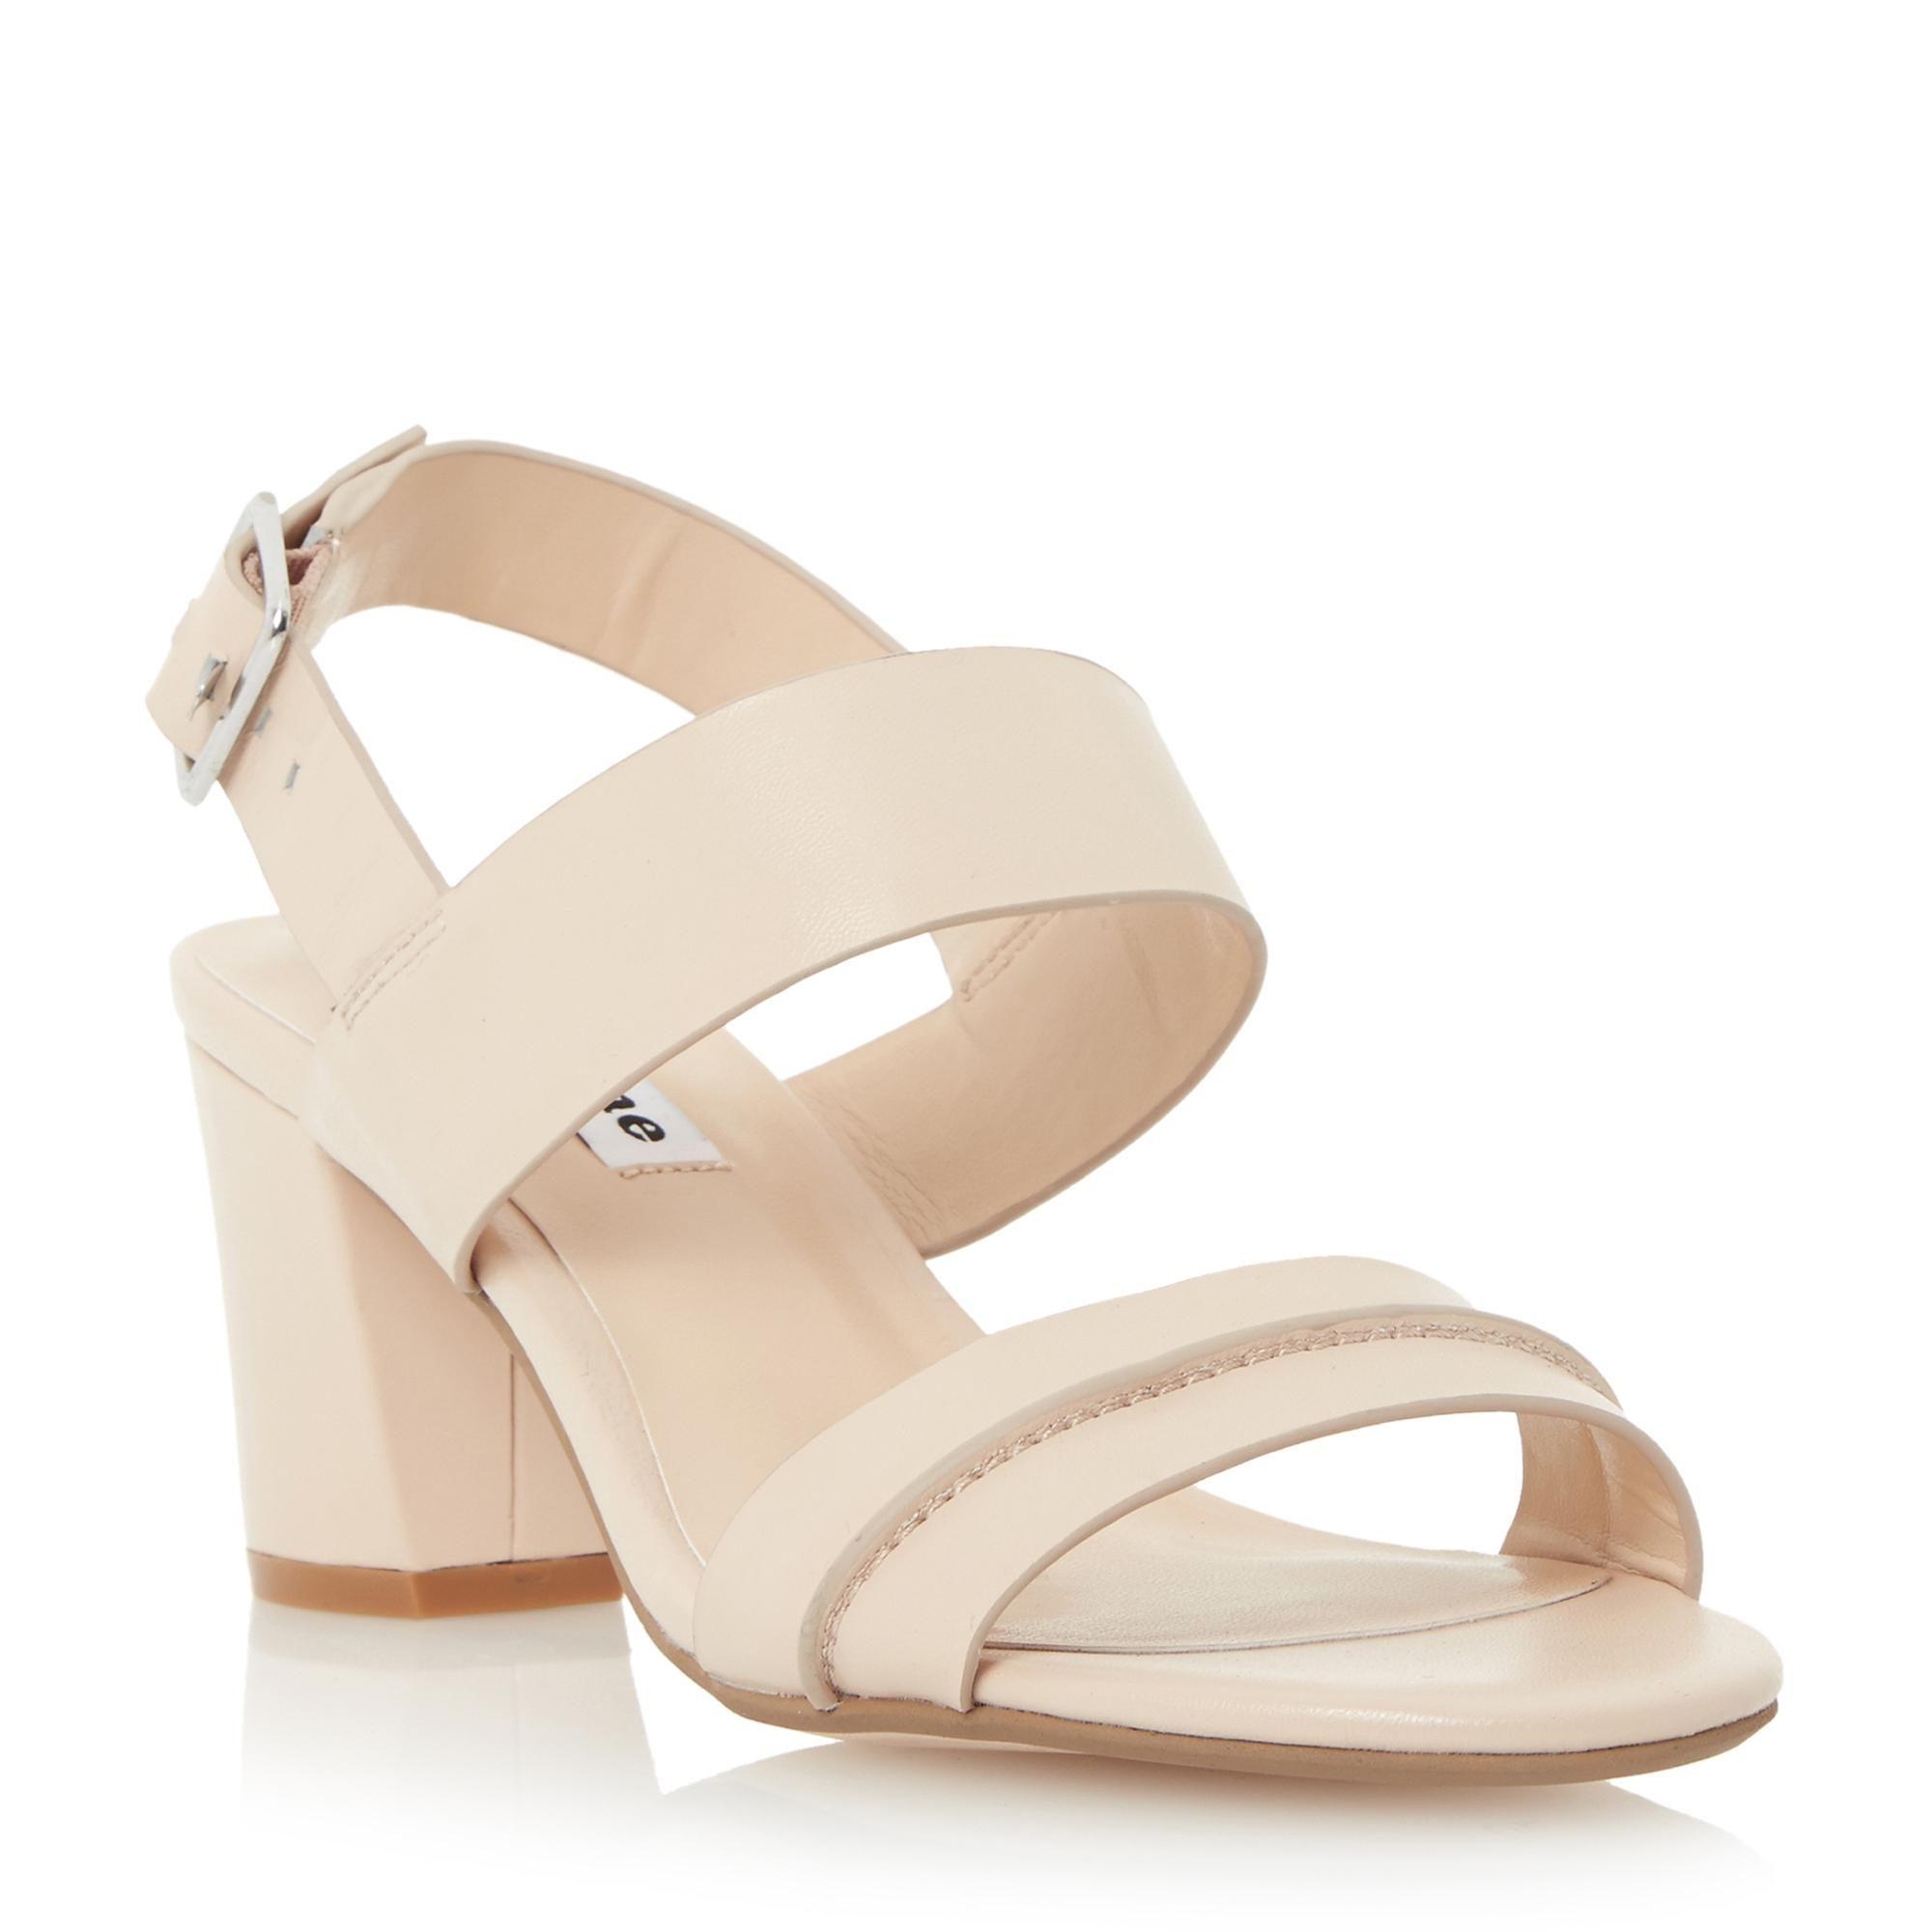 7d560901b7f DUNE LADIES JORO - Two Part Block Heel Sandal - nude